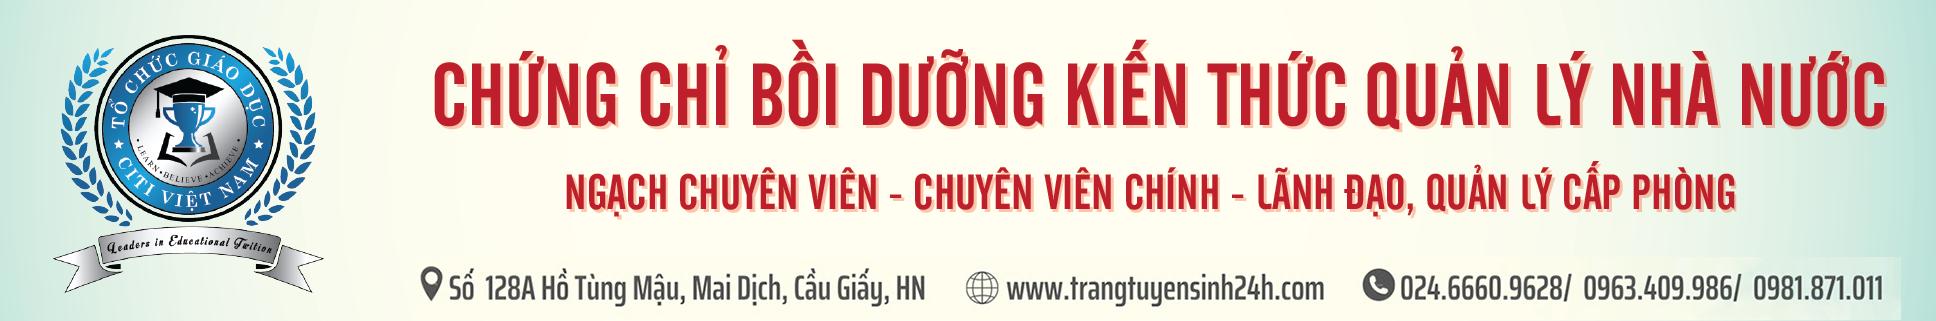 banner citi vn-02